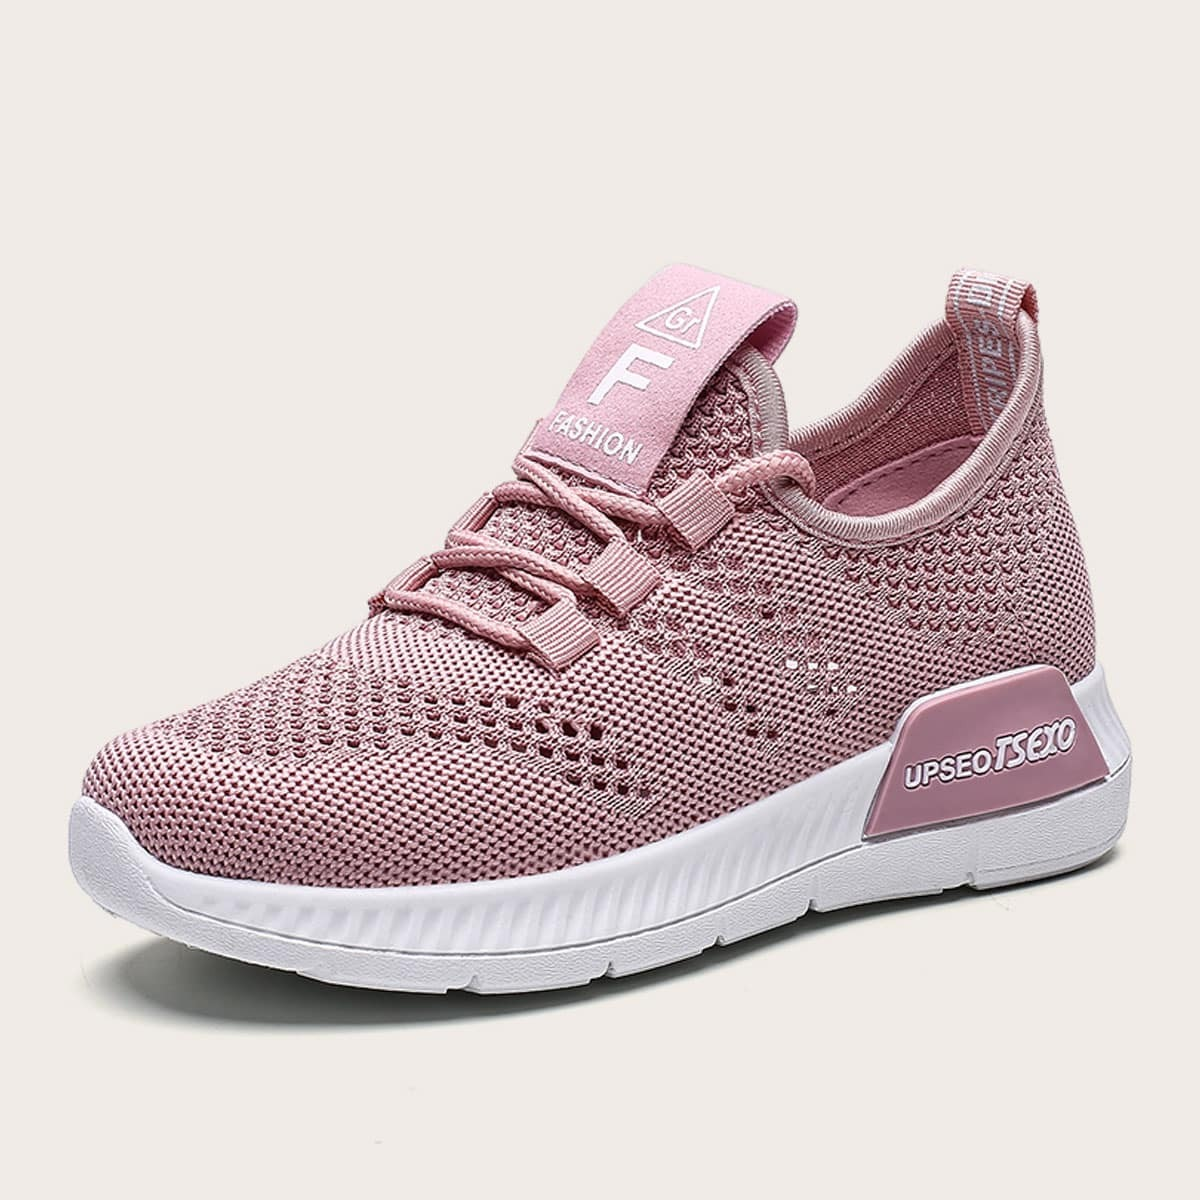 Meisjes Lace-up Front Willekeurige Letter Print Knit Sneakers